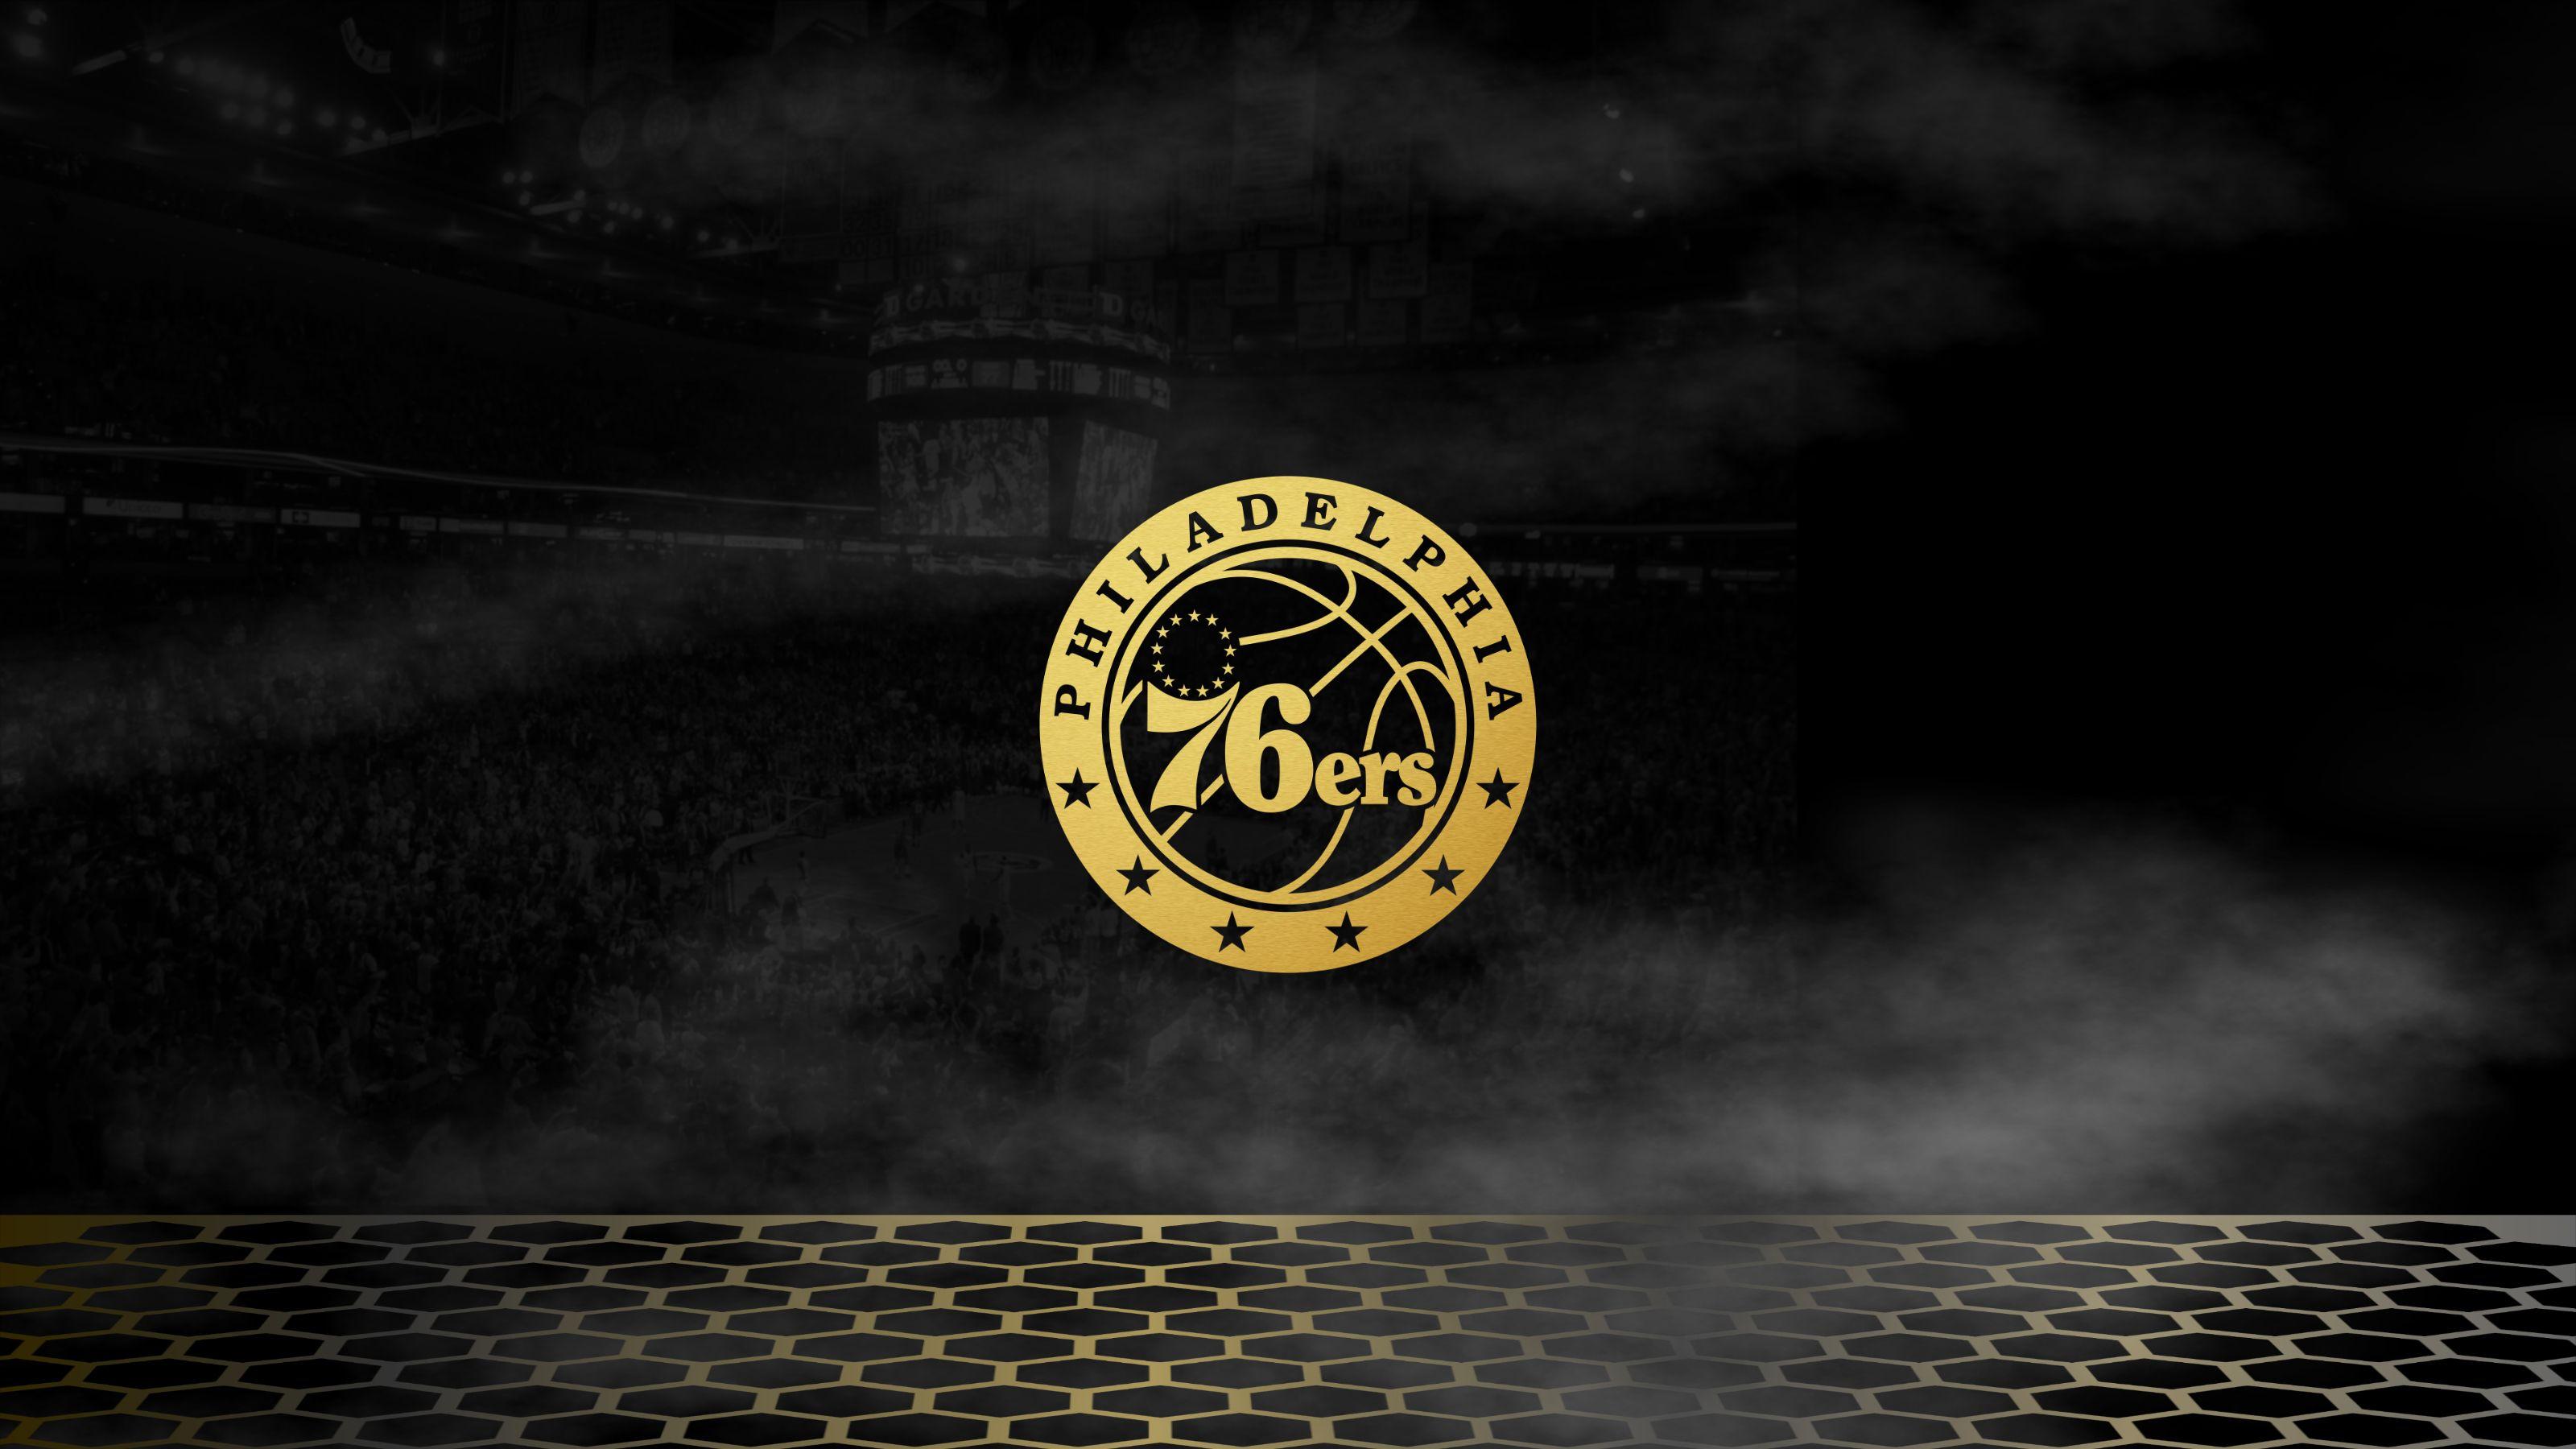 Philadelphia 76ers Desktop Background Nba Wallpaper In 2020 Nba Background Nba Wallpapers Nba Basketball Teams